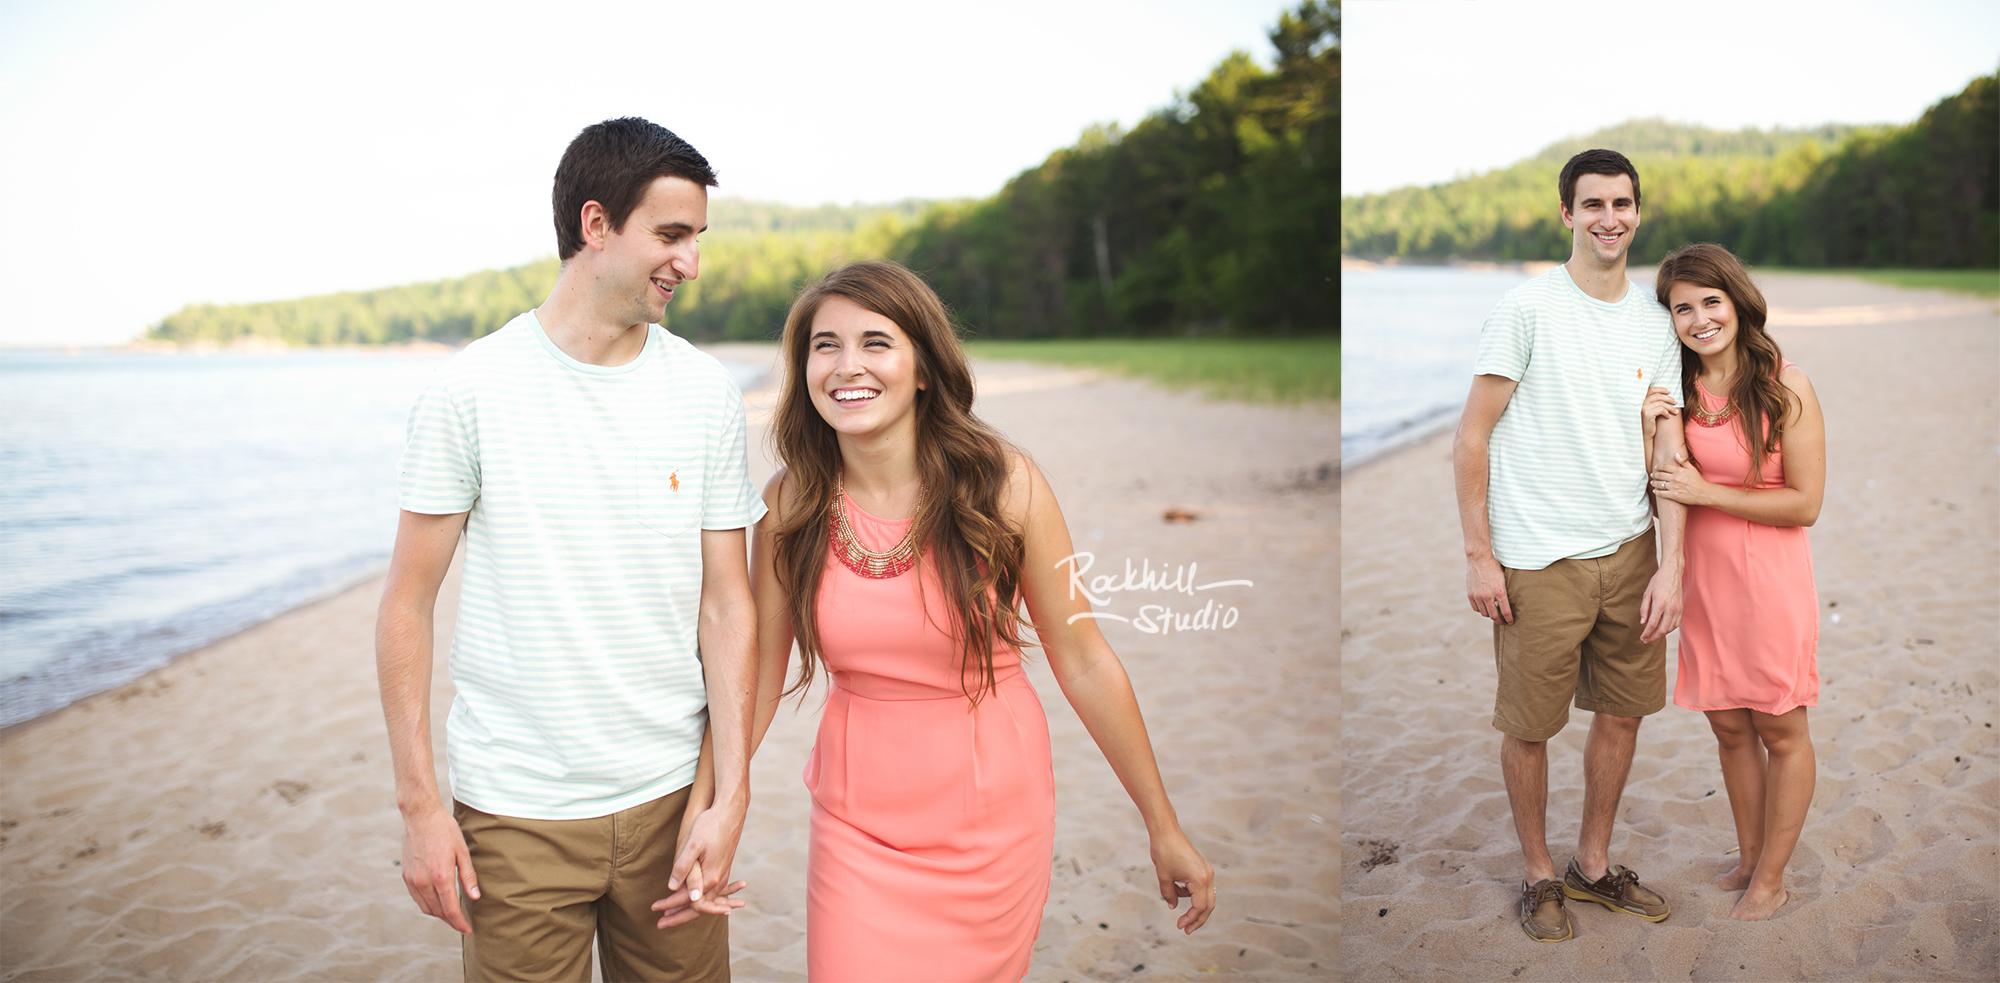 rockhill-studio-marquette-michigan-upper-peninsula-engagement-photographer-wetmore-landing-lake-superior-wedding-21.jpg